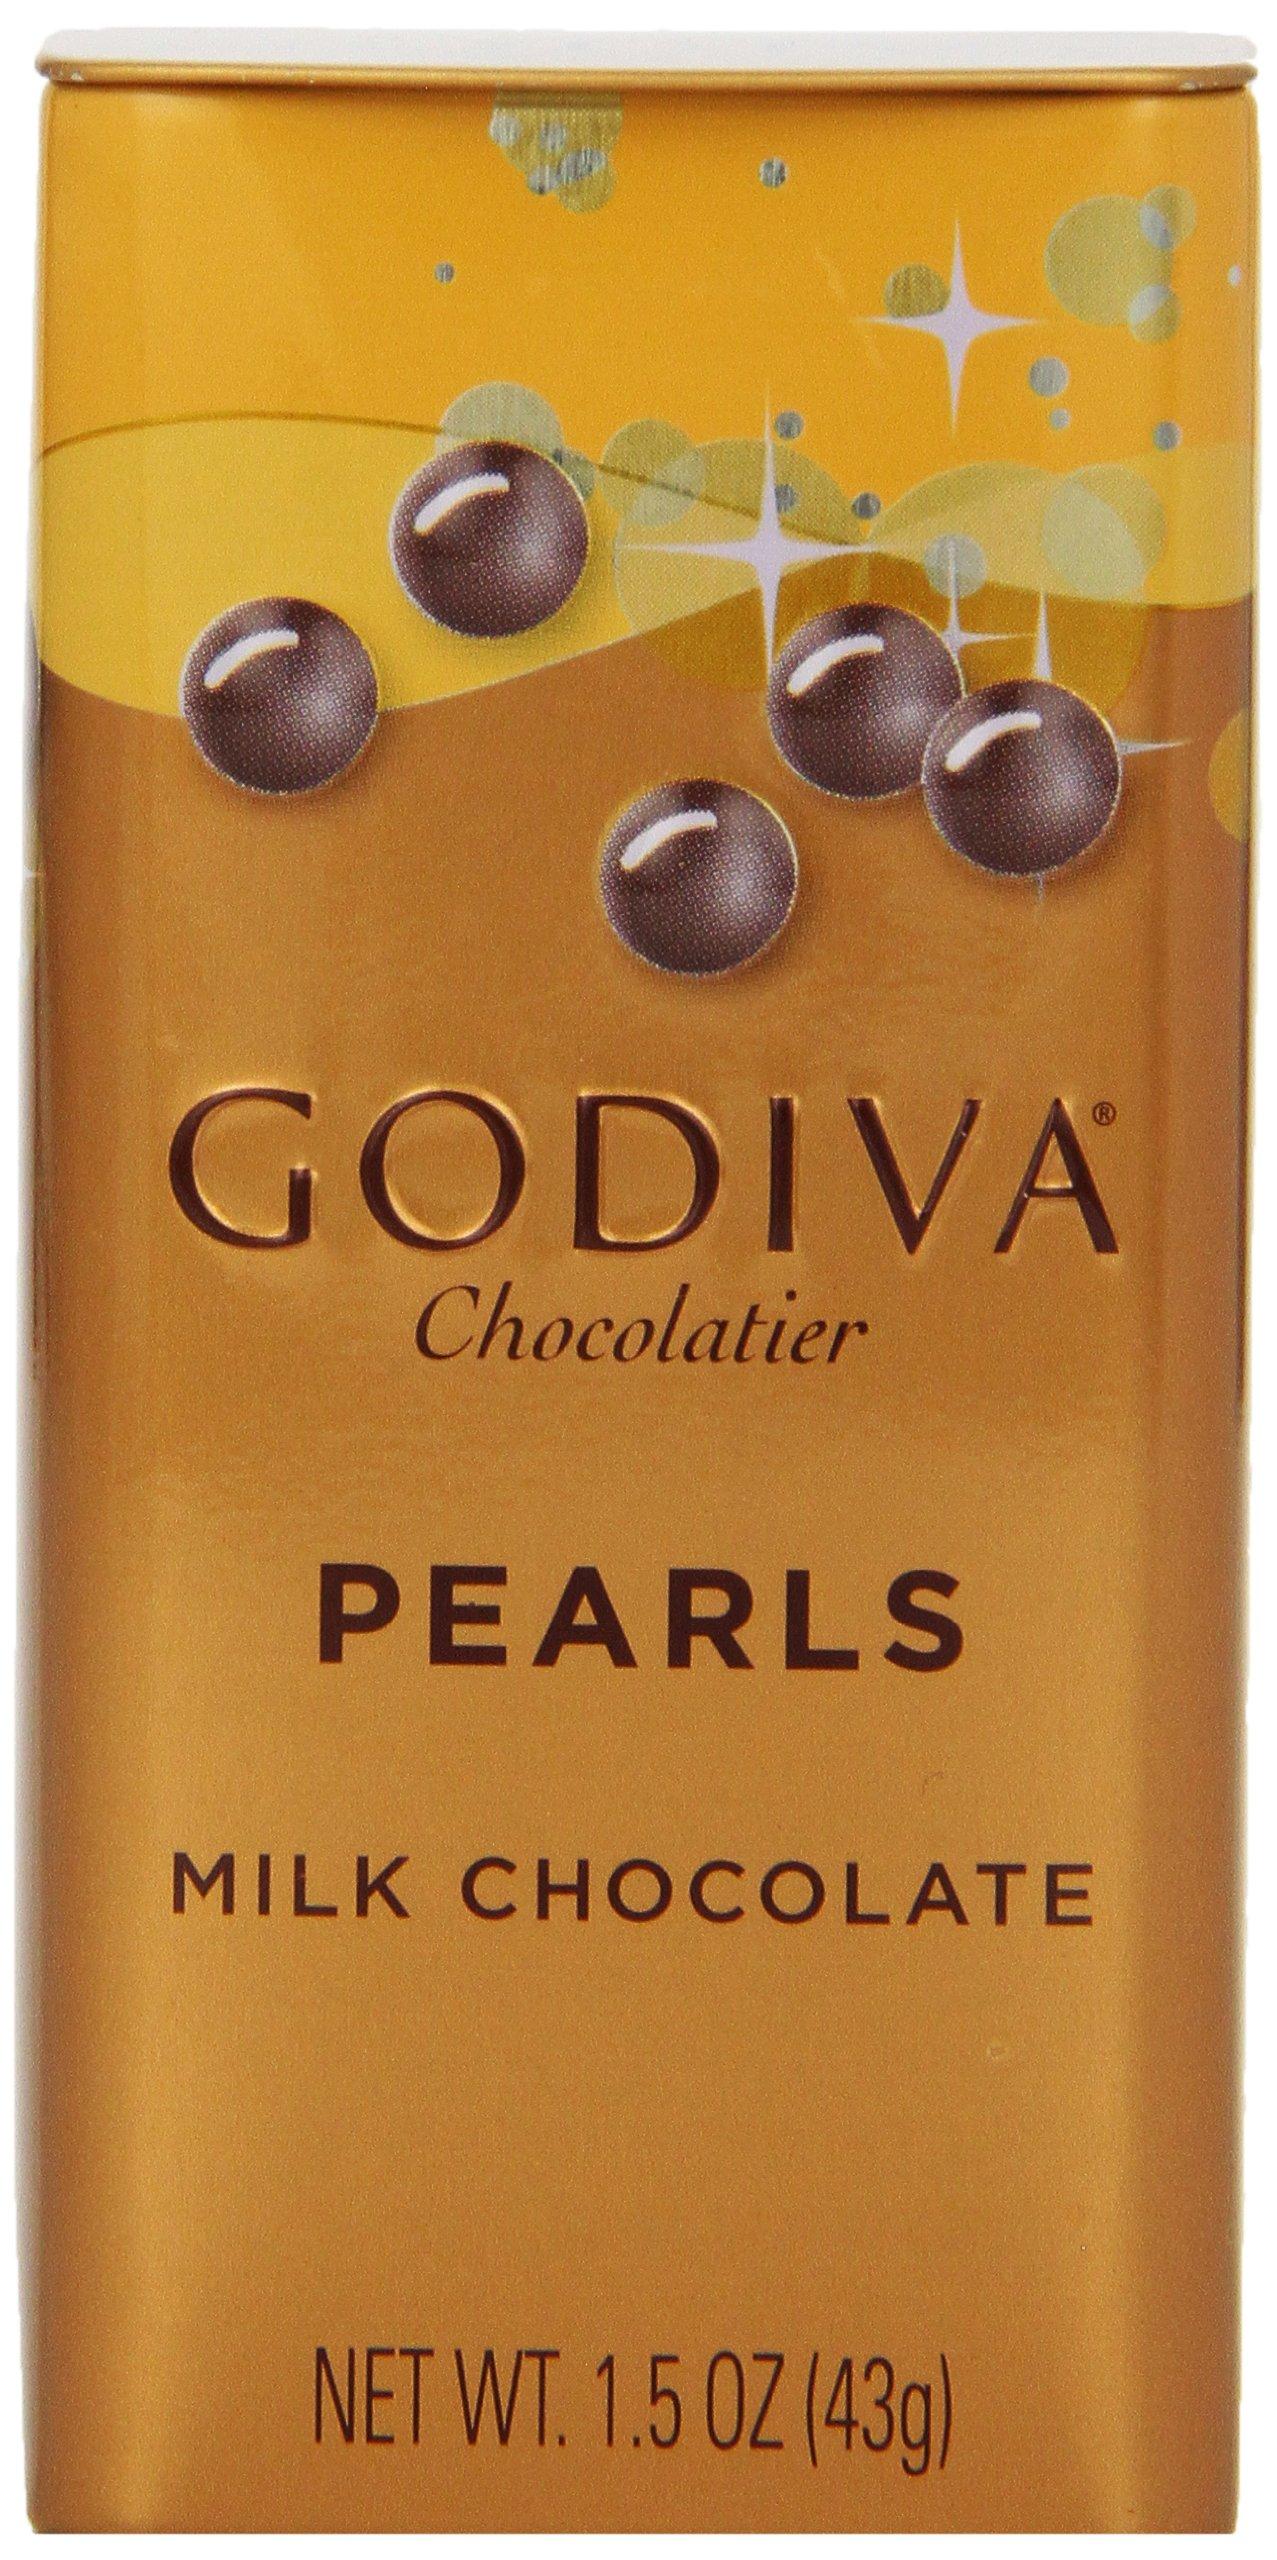 Godiva Milk Chocolate Pearls, 1.5-ounces (Pack of 6) by Godiva